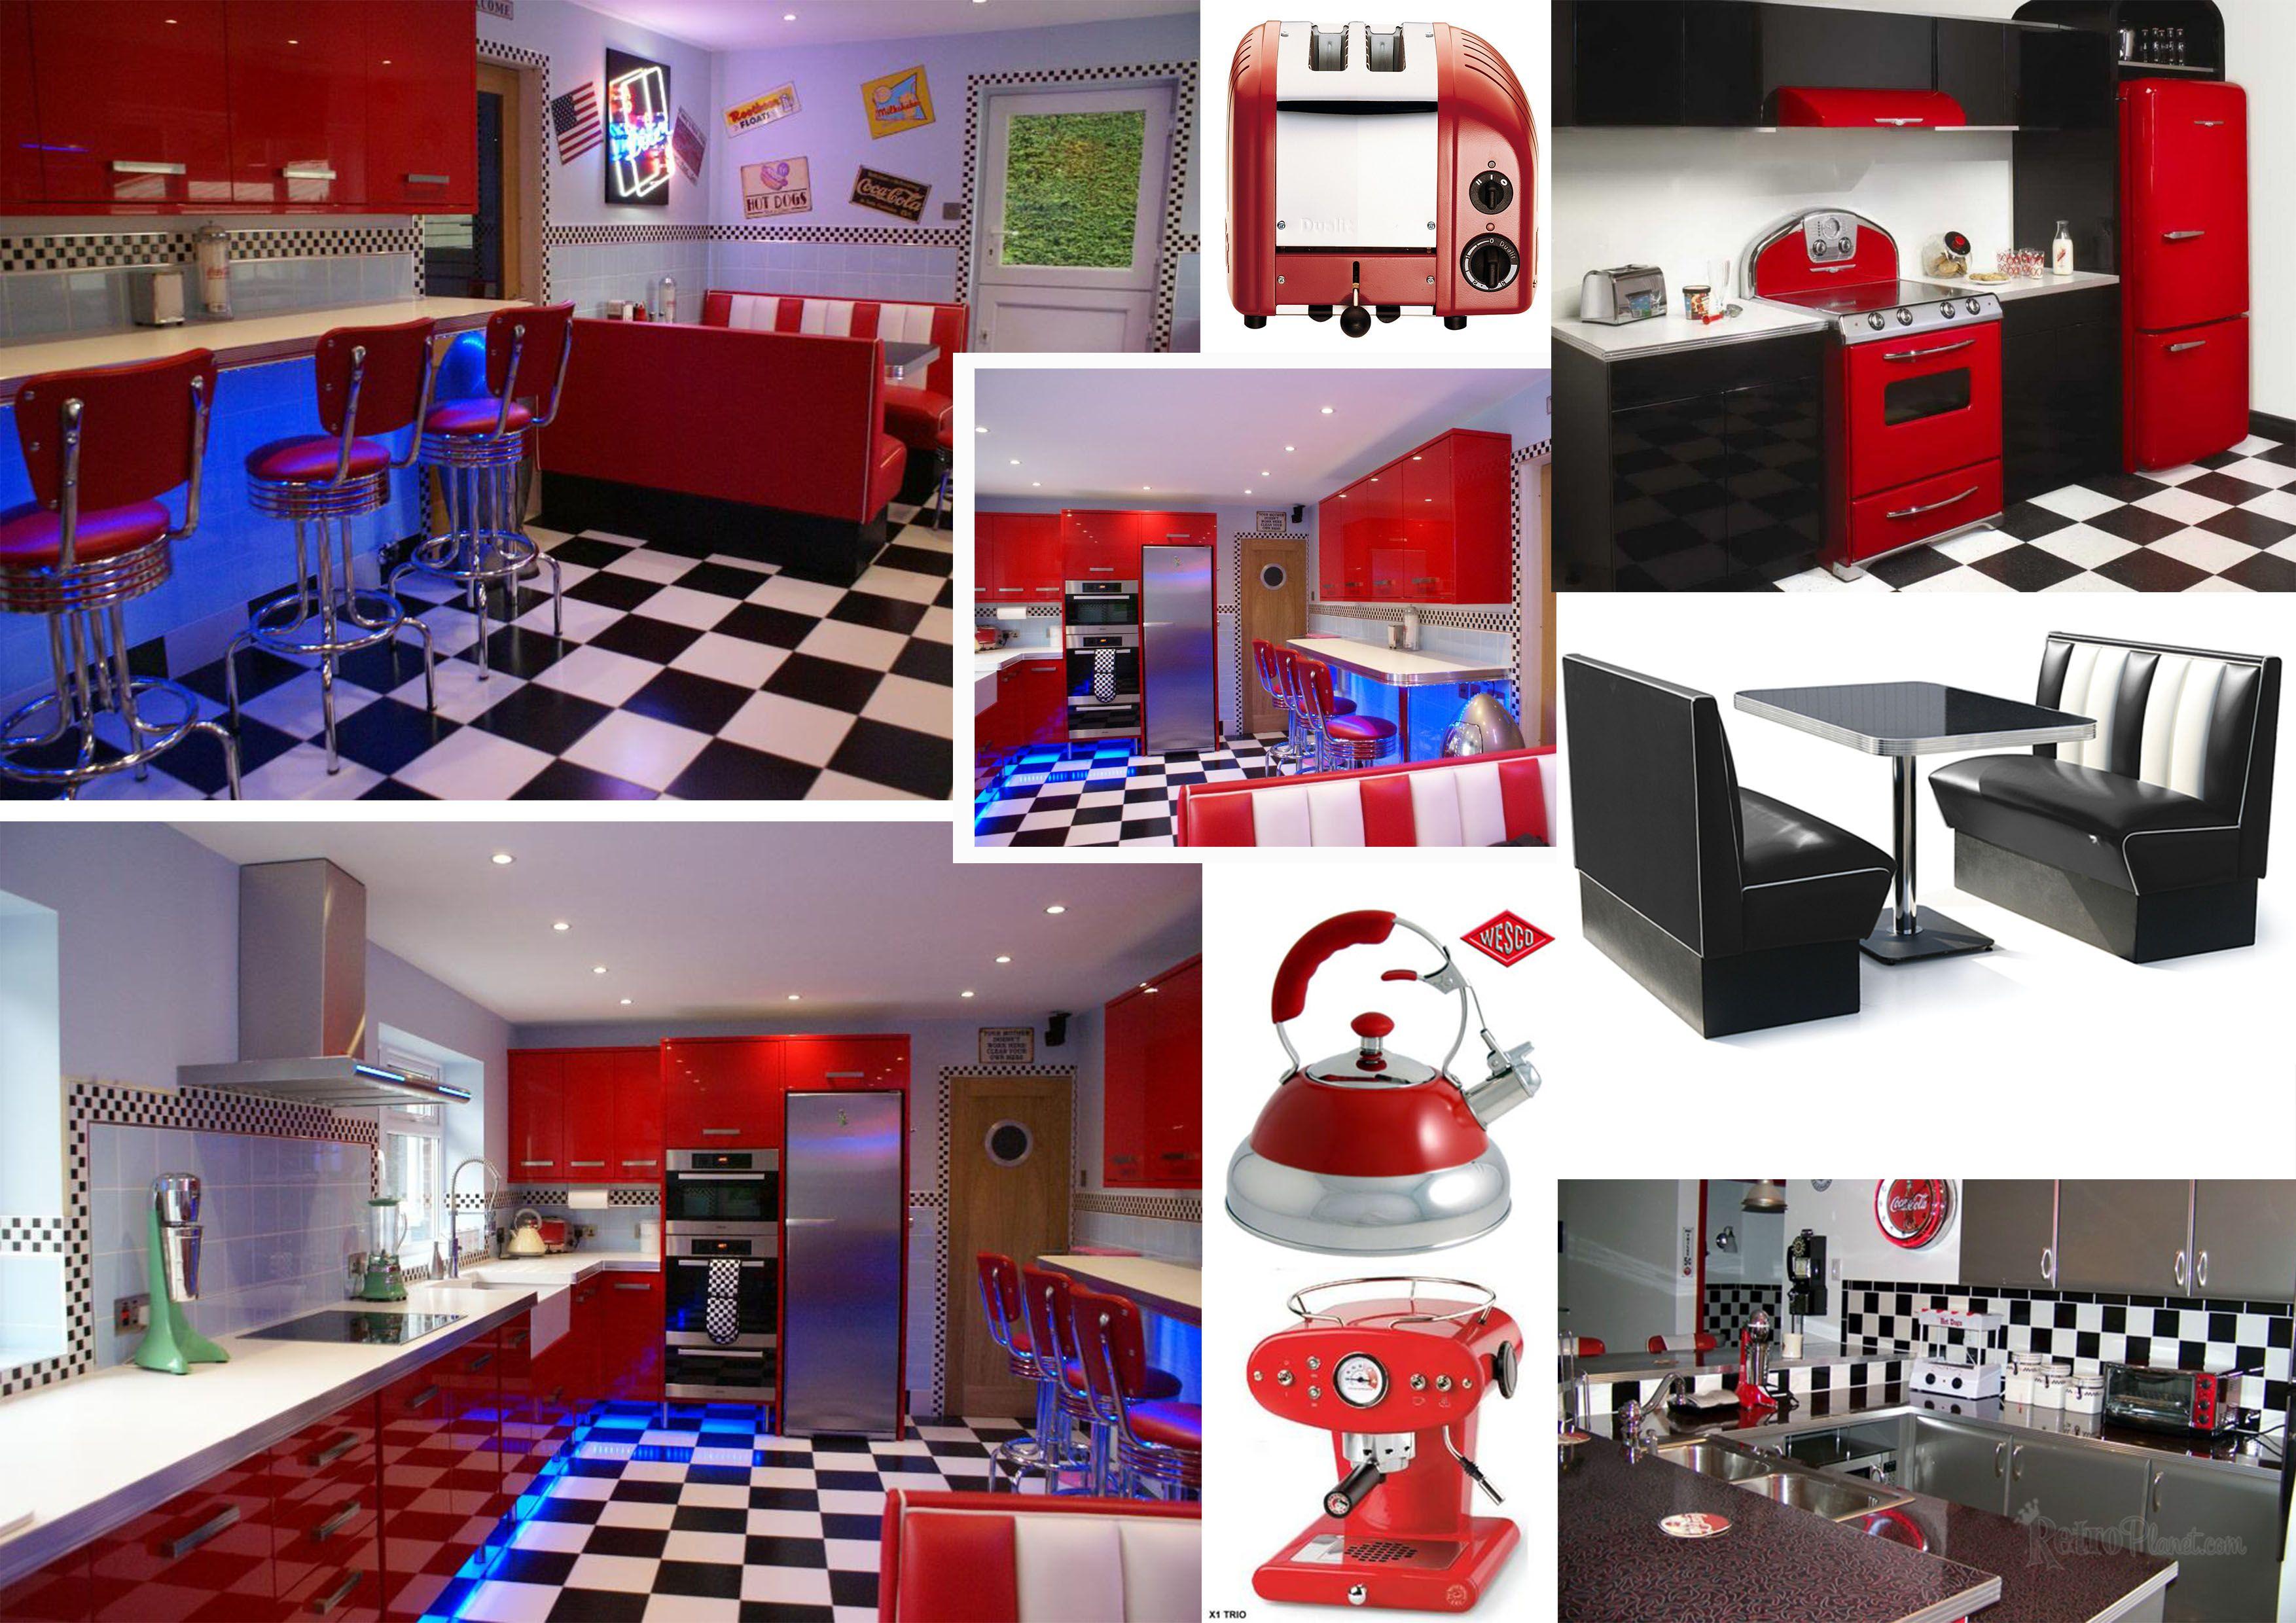 Pin By Jocelyn Neville On Aspirations Dreams Goals Kitchen Decor Pictures Kitchen Design Decor Coastal Kitchen Decor